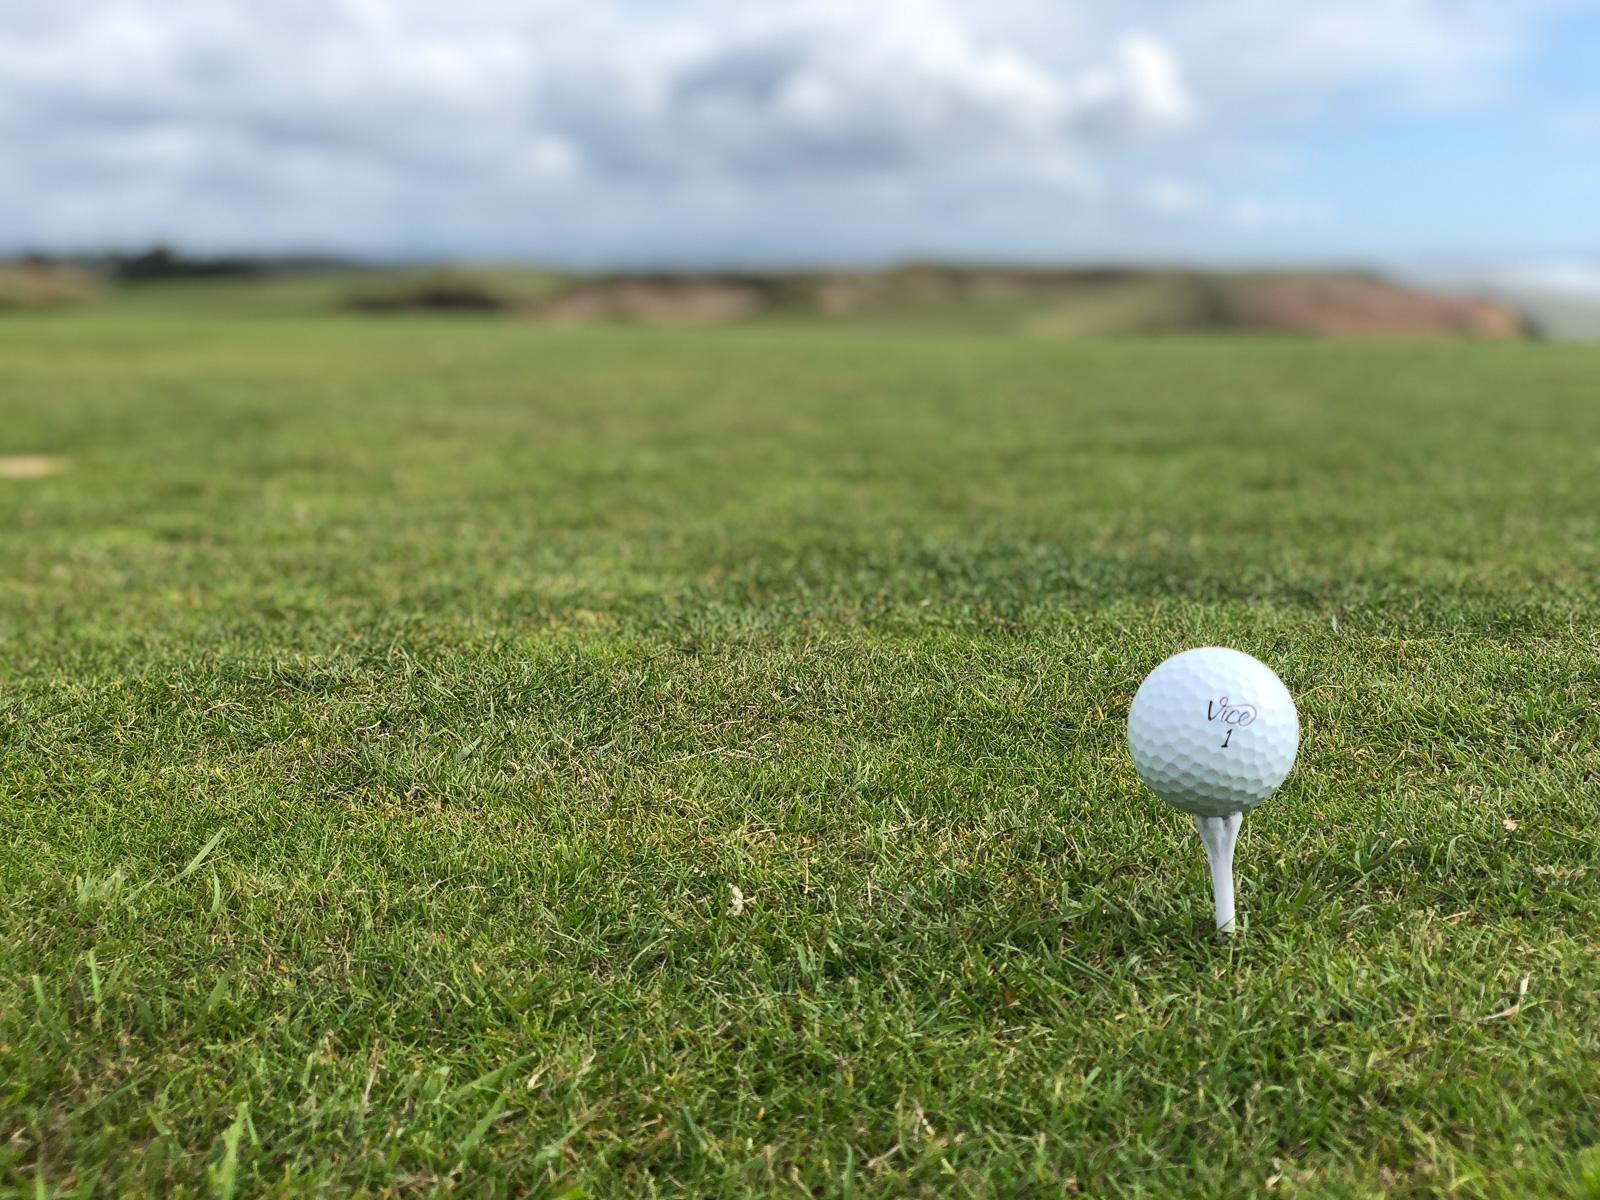 Vice Pro Pluis Golf Ball